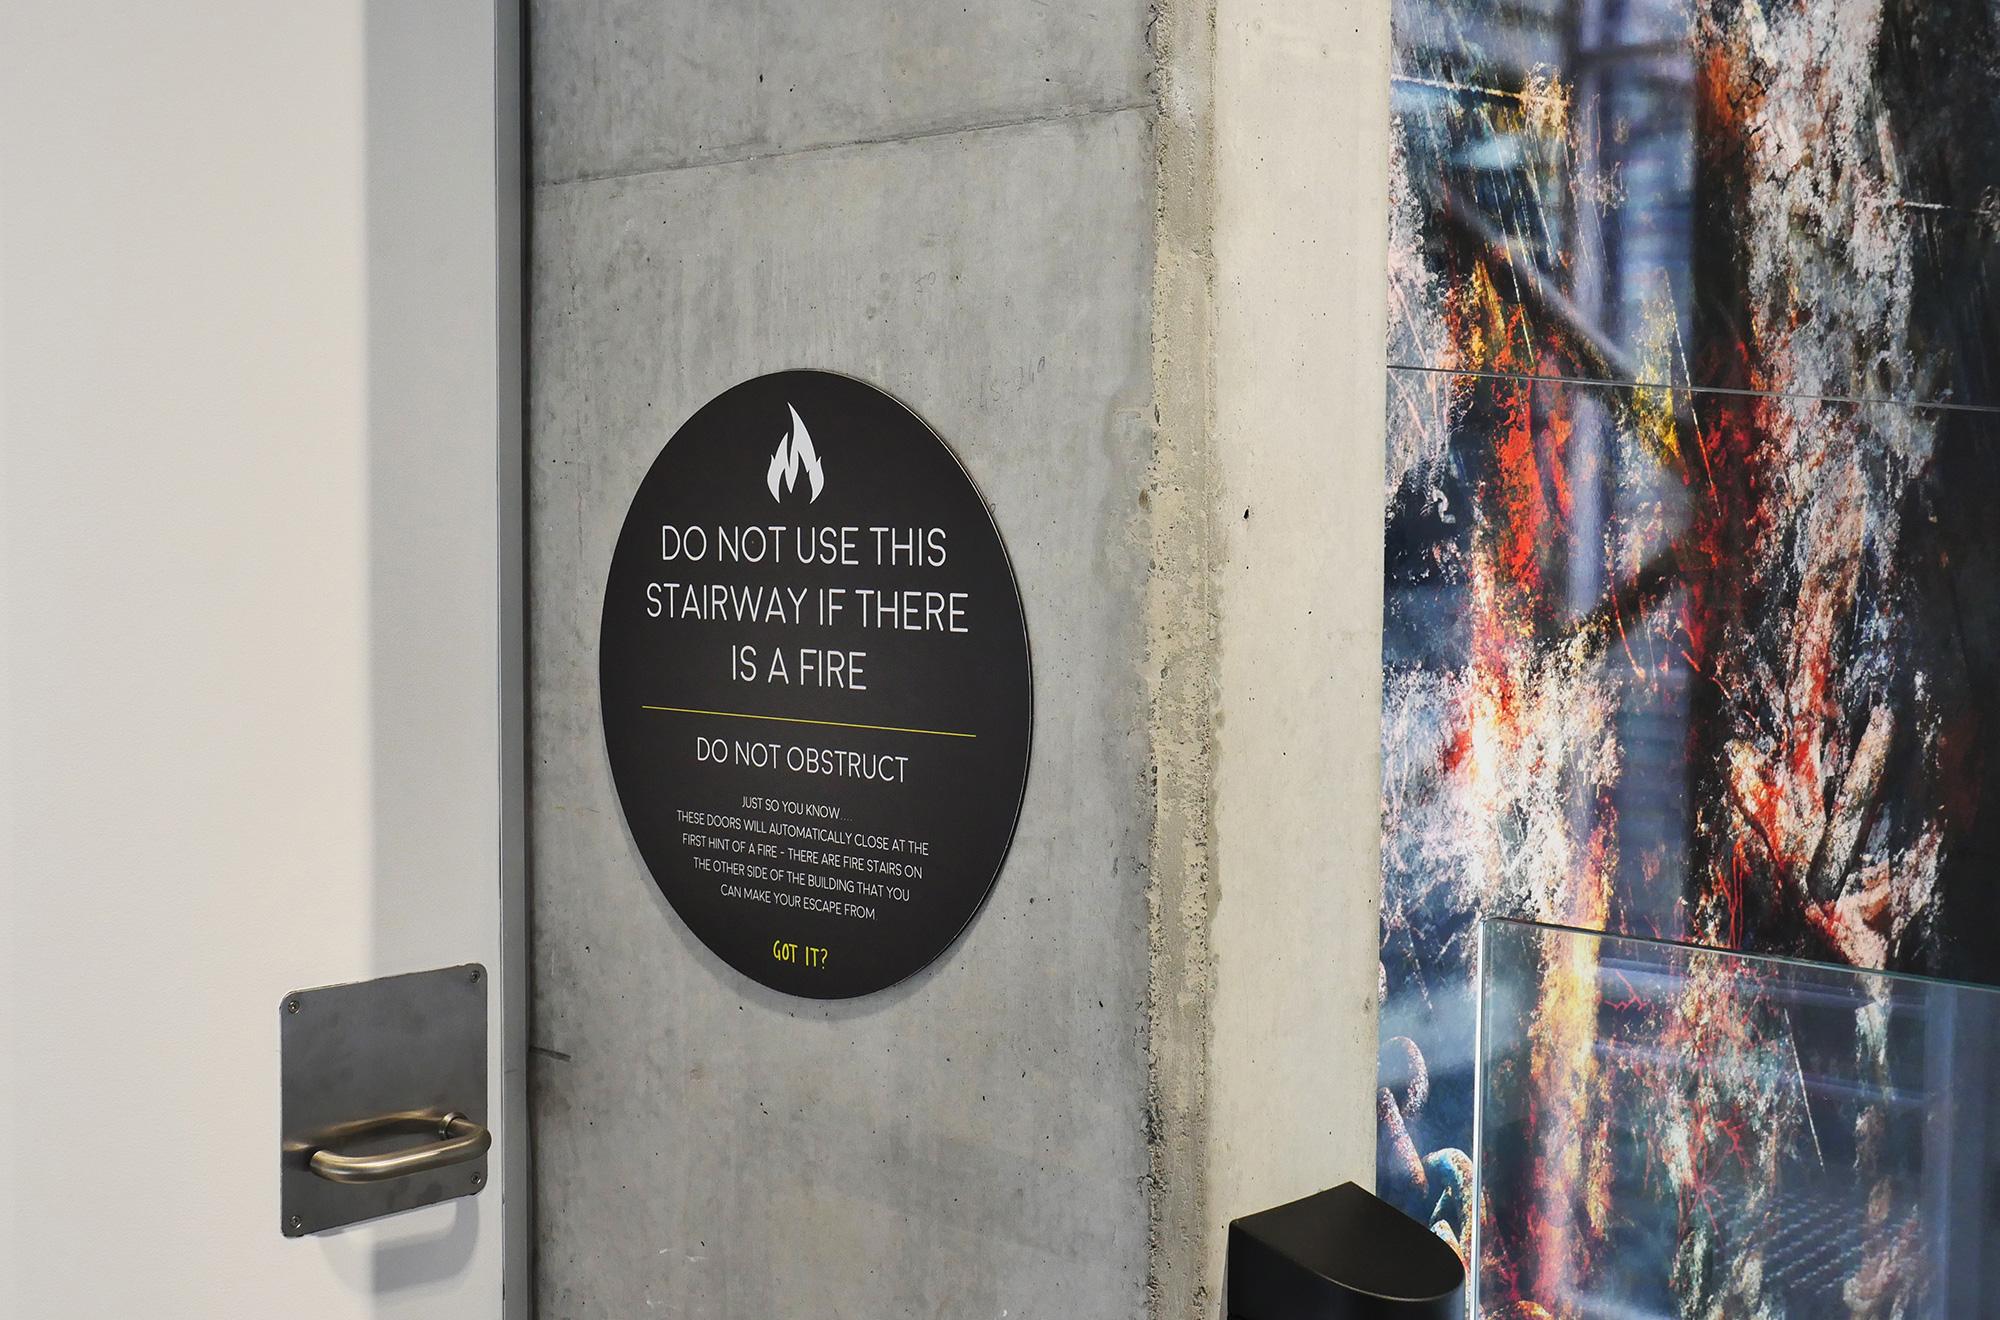 UOW i Accelerate - Statutory Fire Door Signage